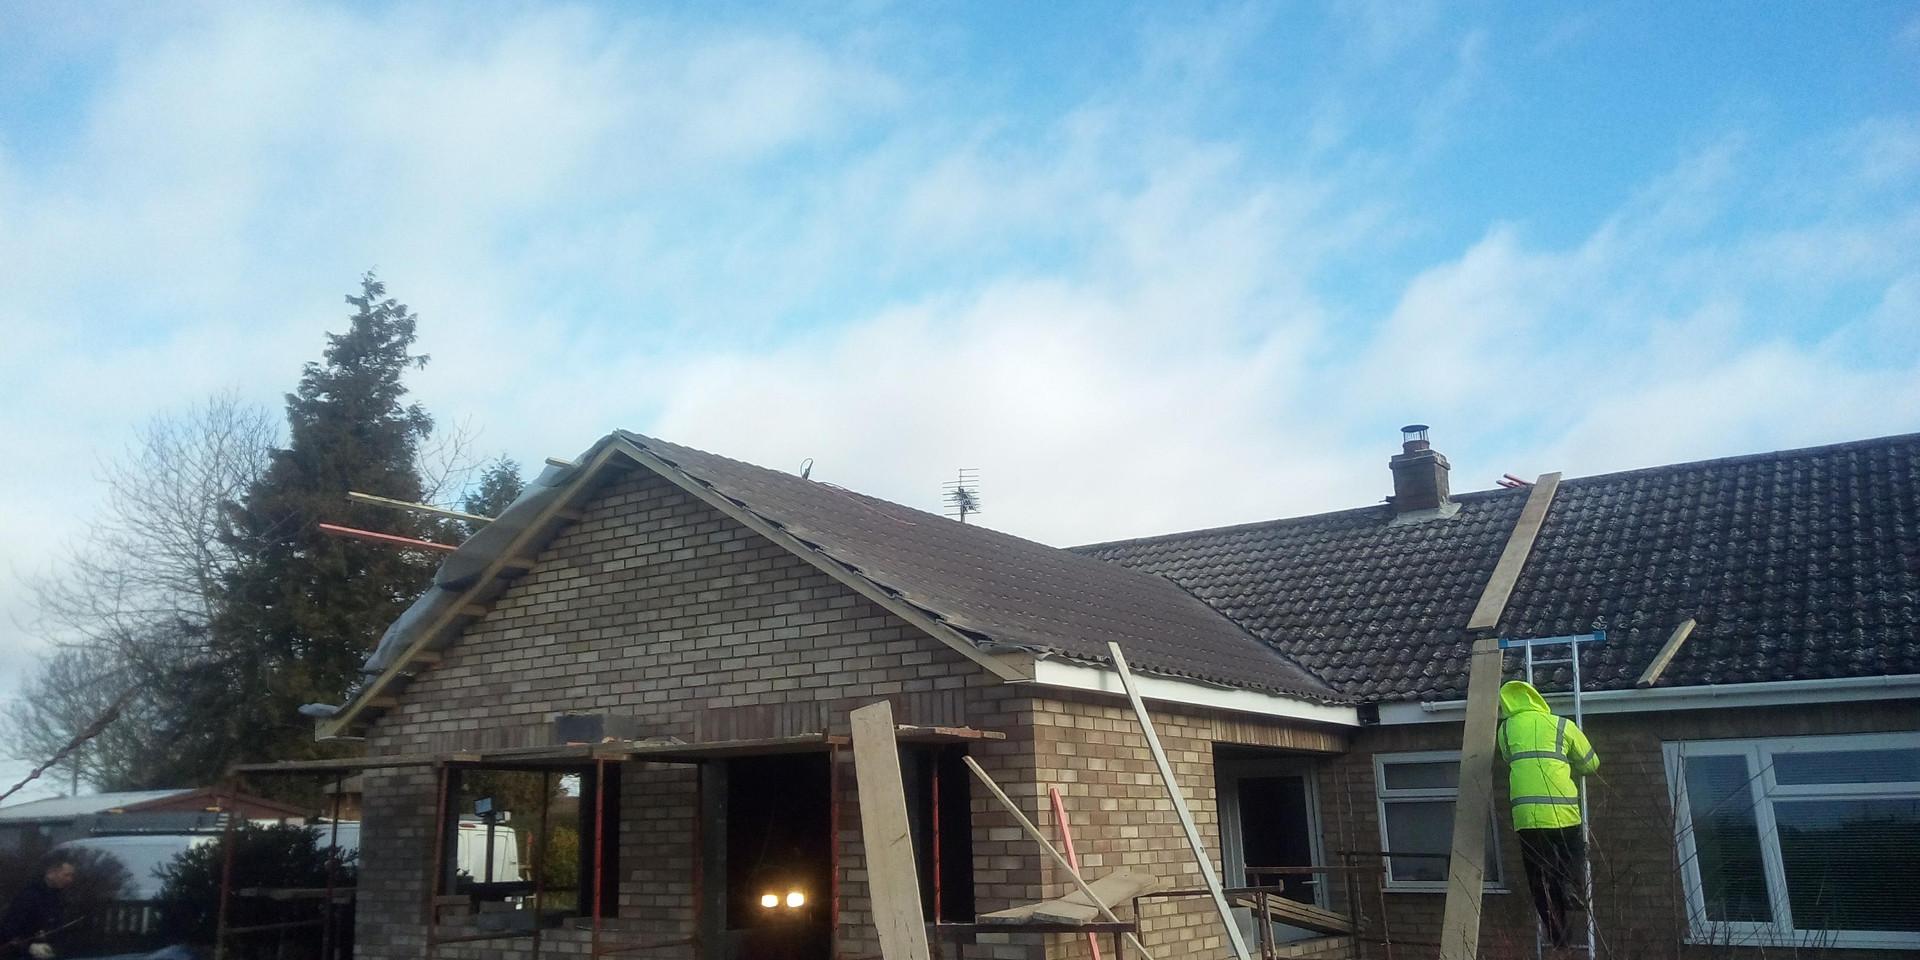 Wisbeach extention buildiers uk